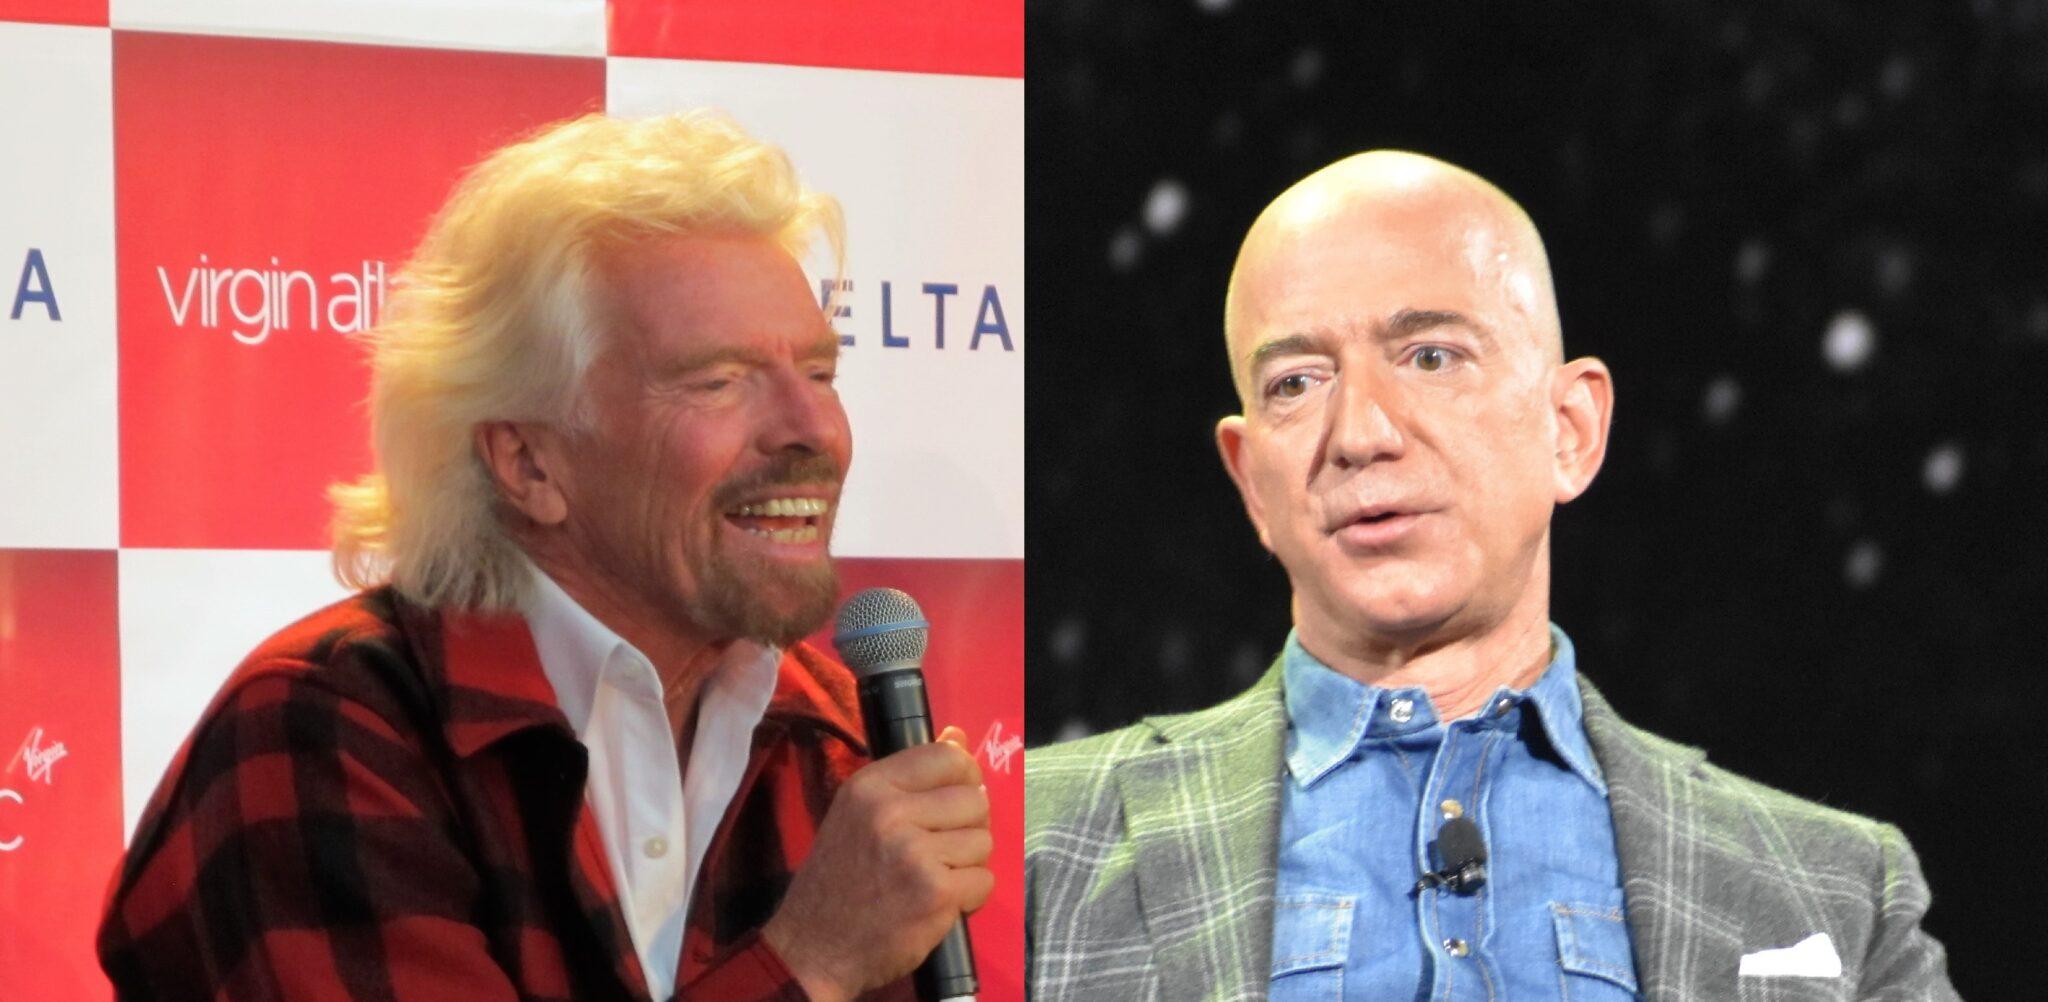 Jeff Bezos' Blue Origin fuels feud with Richard Branson's Virgin Galactic over suborbital space trips